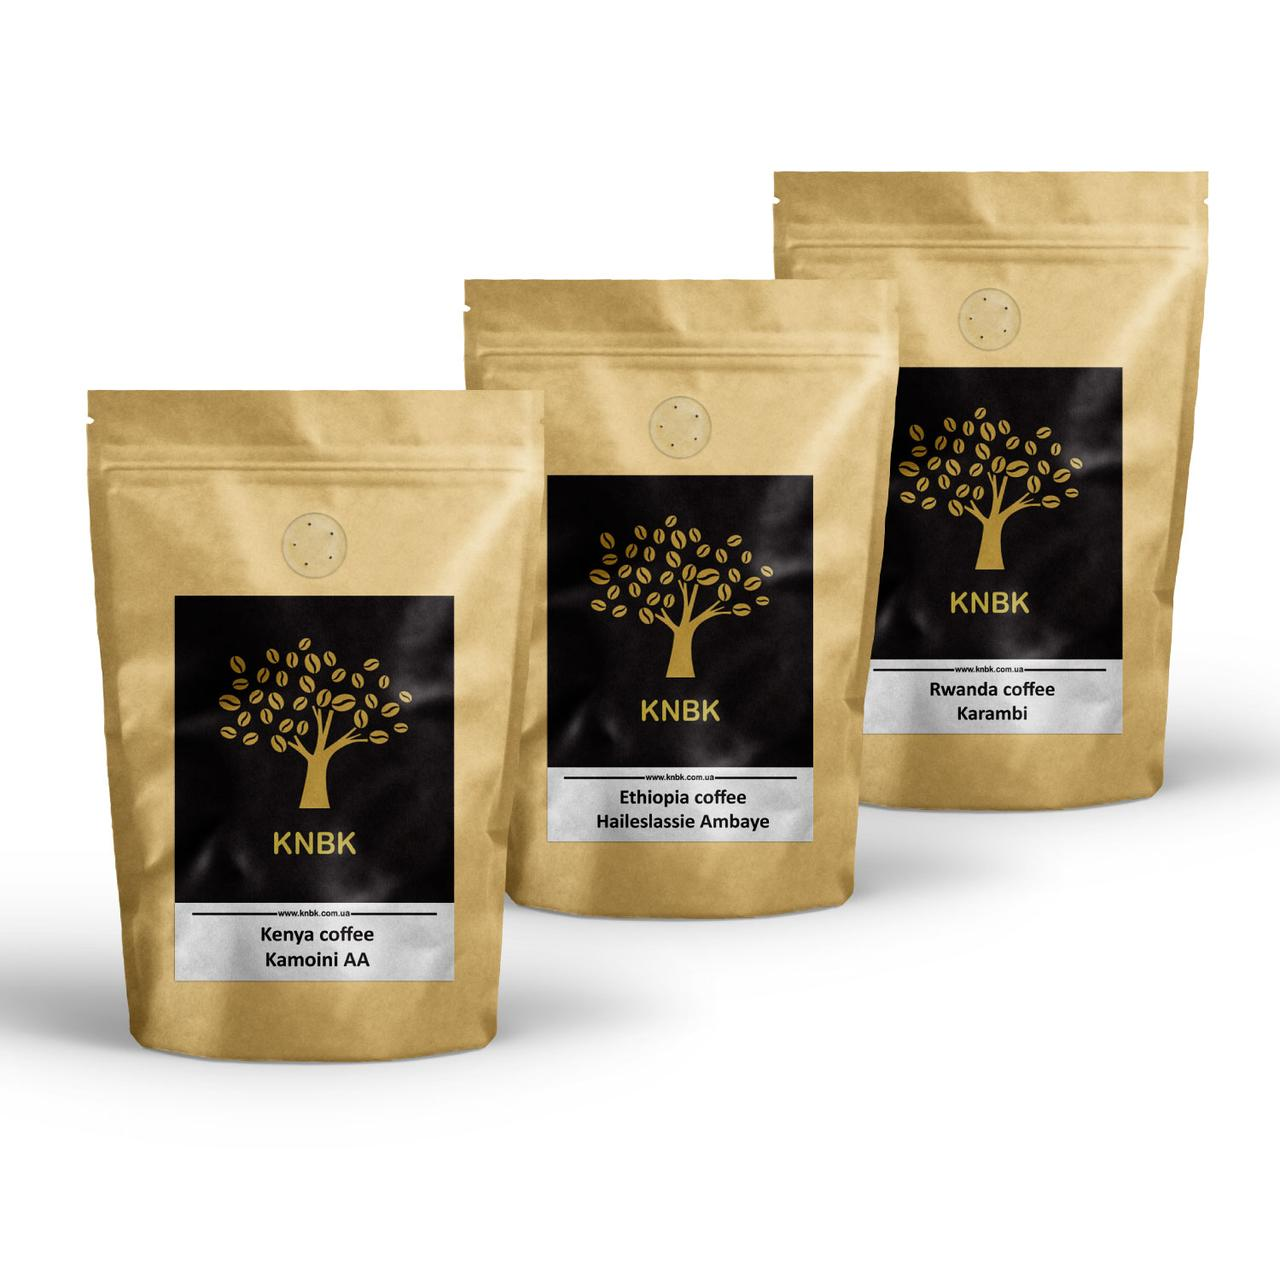 Набор кофе светлой обжарки под фильтр Rwanda Karambi/Ethiopia Haileslassie/Kenya Kamoini 300 грамм